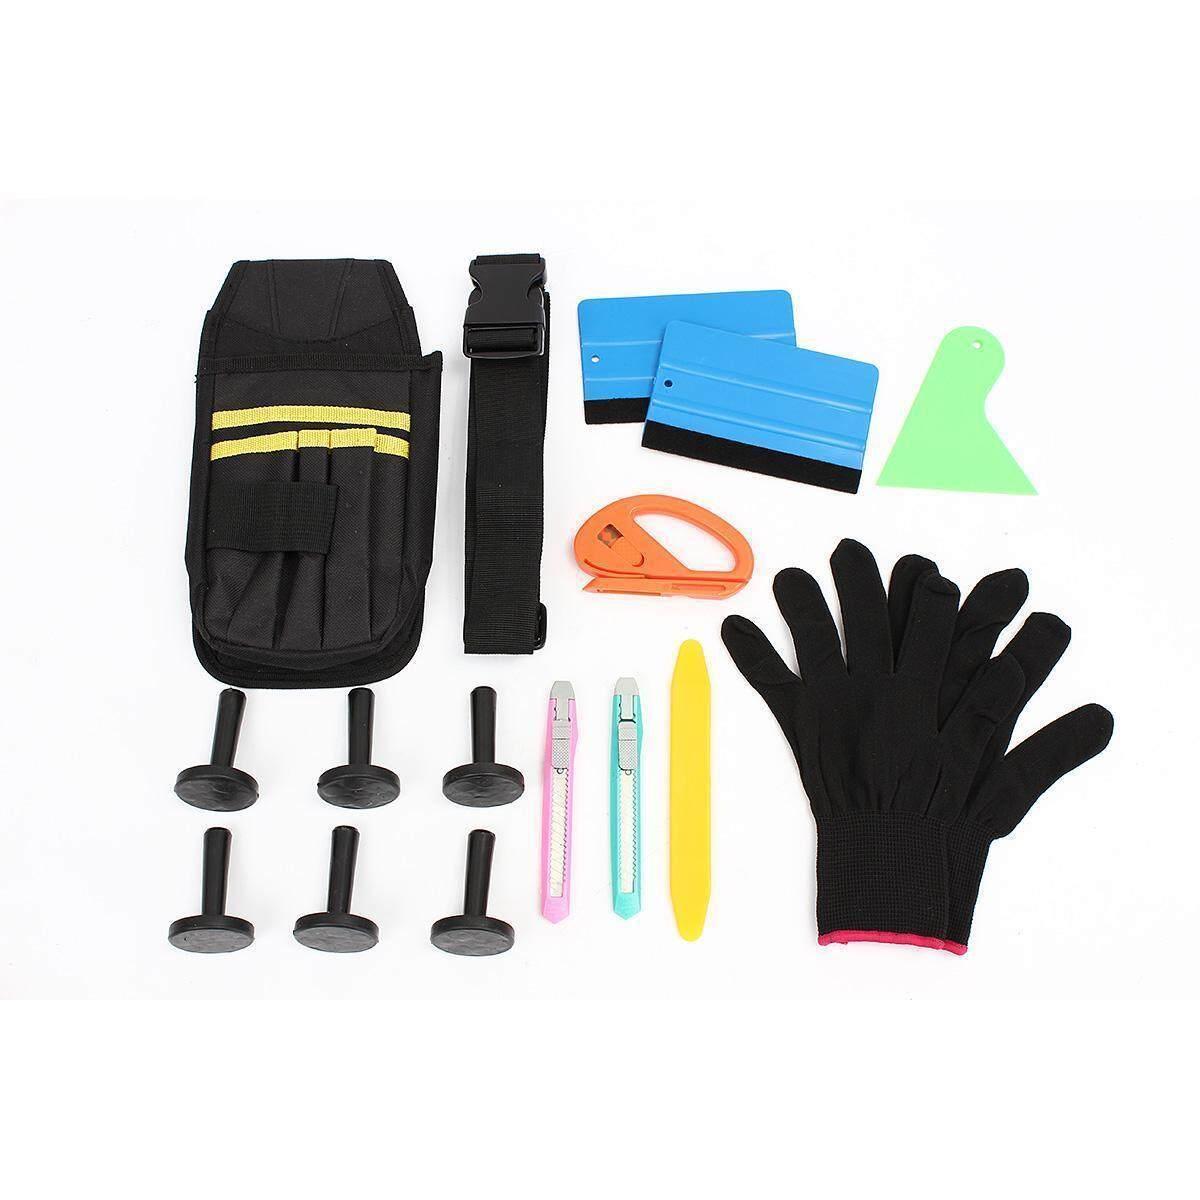 Professional Car Vinyl Wrap Tools Bag Kit Squeegee Razor Cutter Gloves